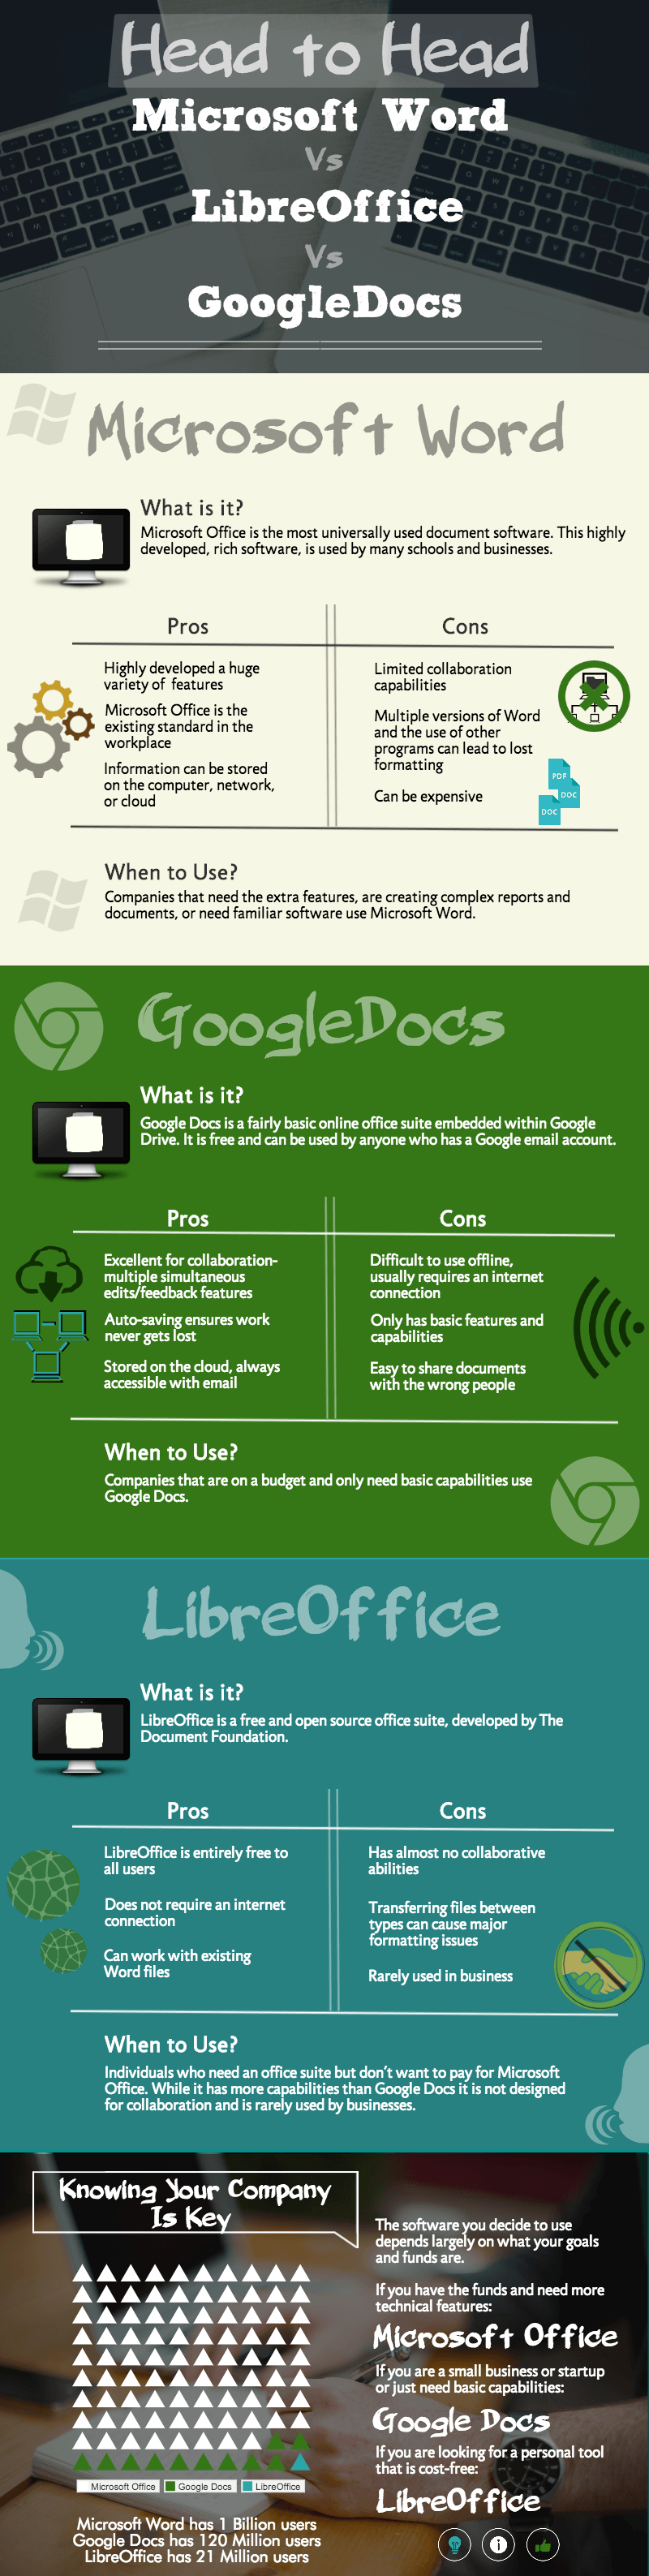 INFOGRAPHIC: Microsoft Word vs Google Docs vs LibreOffice ...